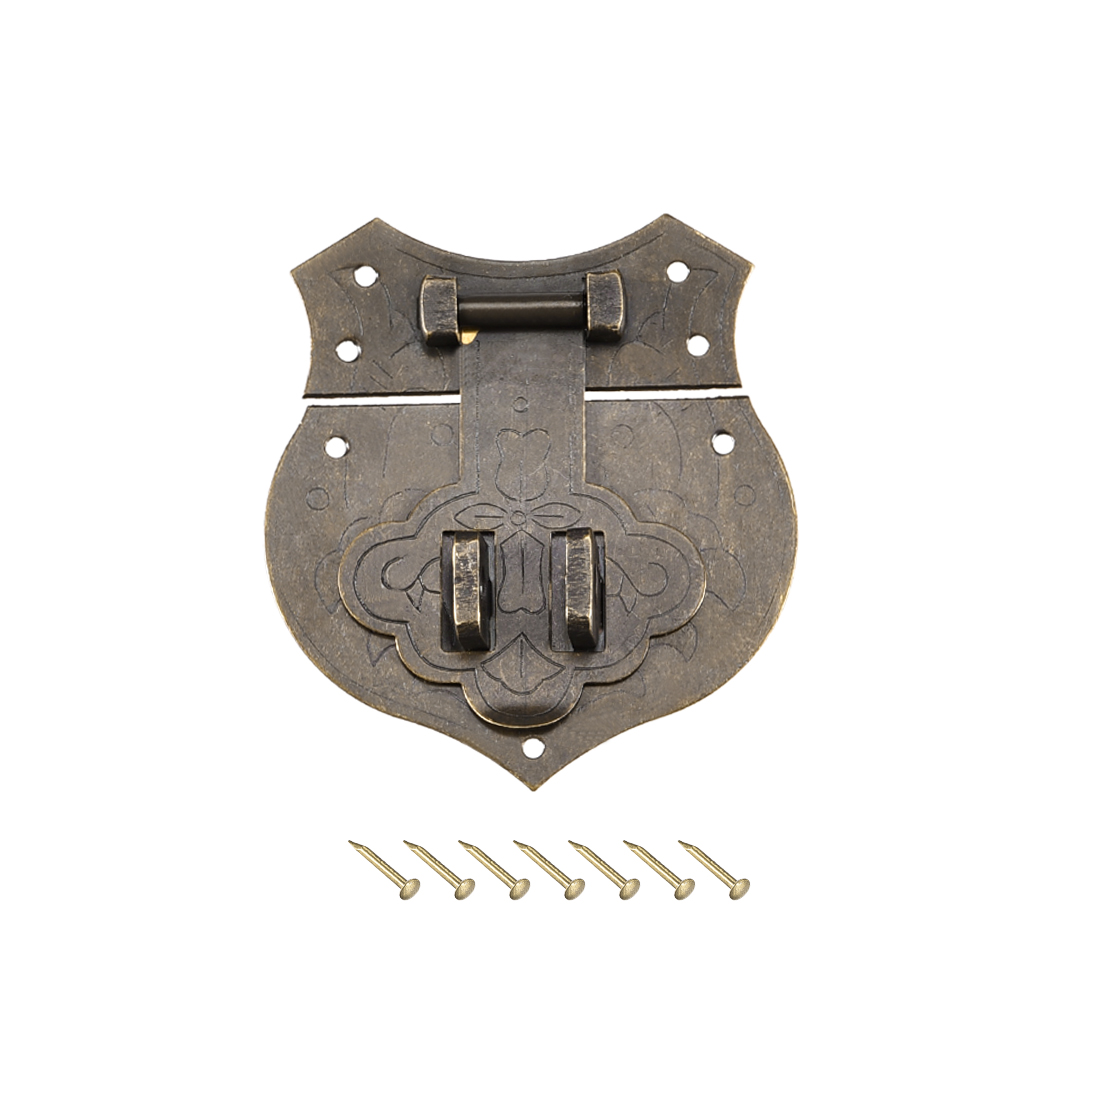 Wood Case Box Hasp 40x43mm Closure Brass Antique Latches Bronze Tone, 2 Pcs